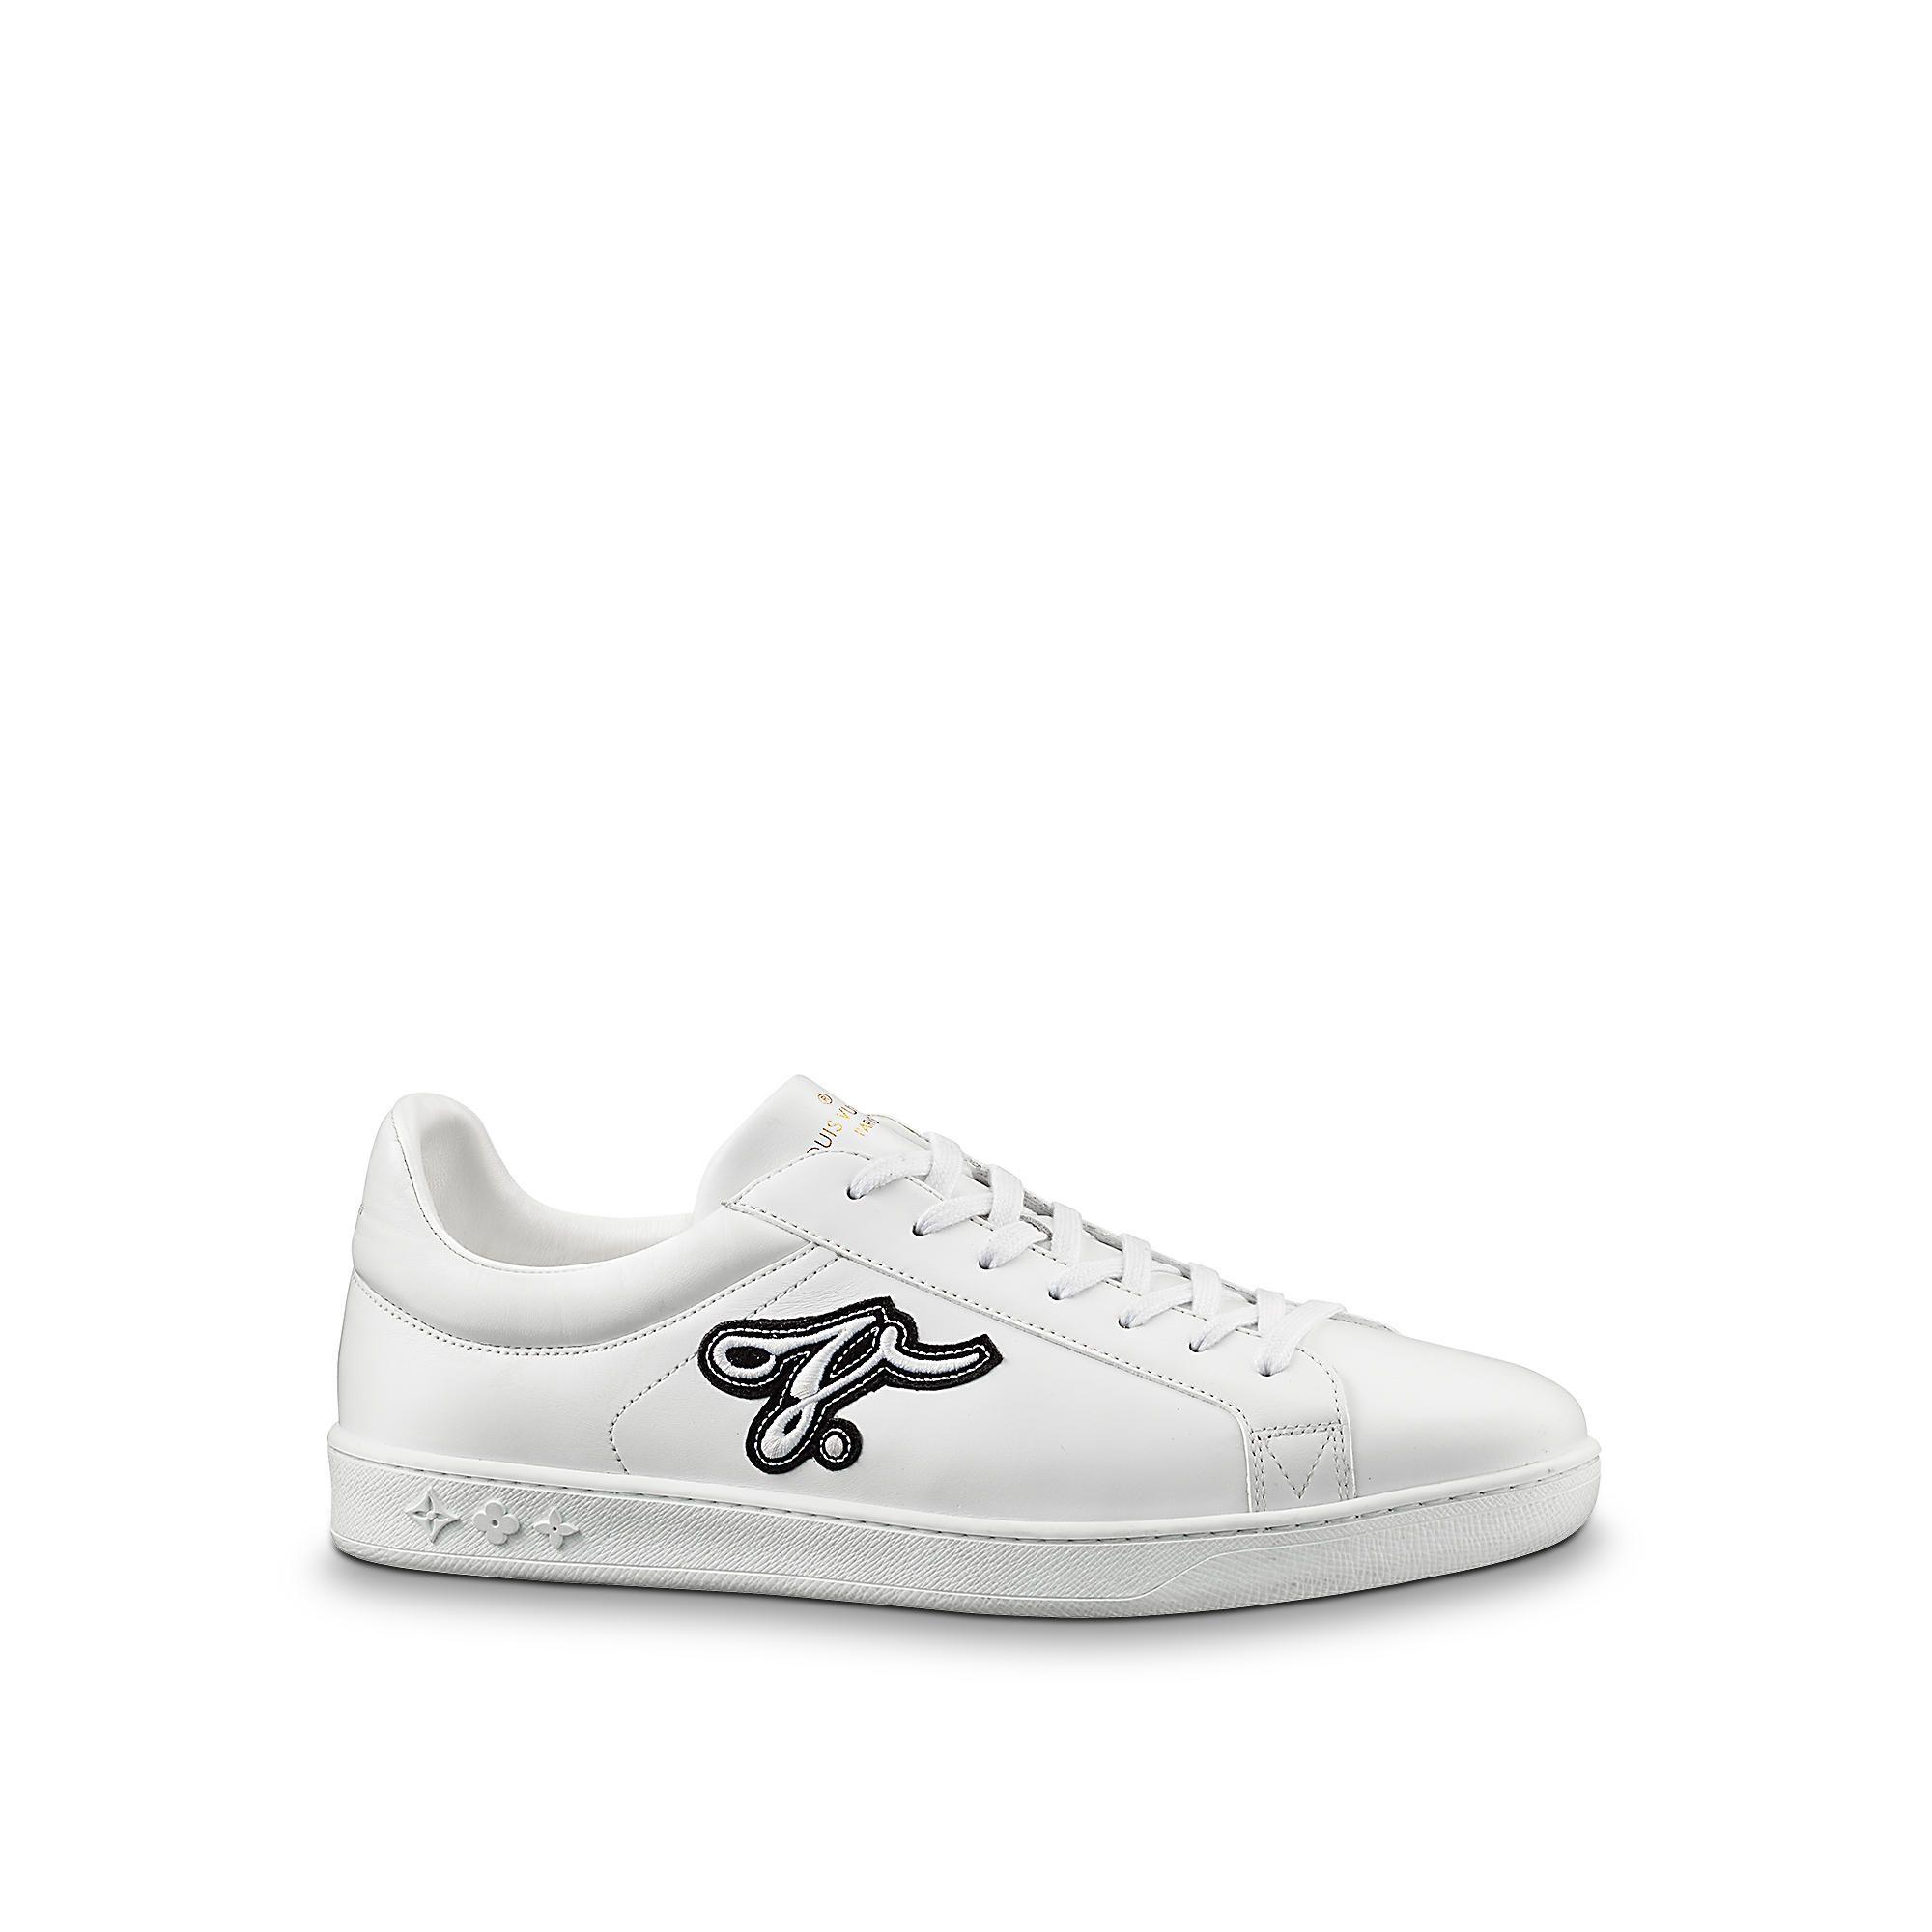 a3e488d7f535 Luxembourg Sneaker via Louis Vuitton   Casual Shoes   Pinterest ...